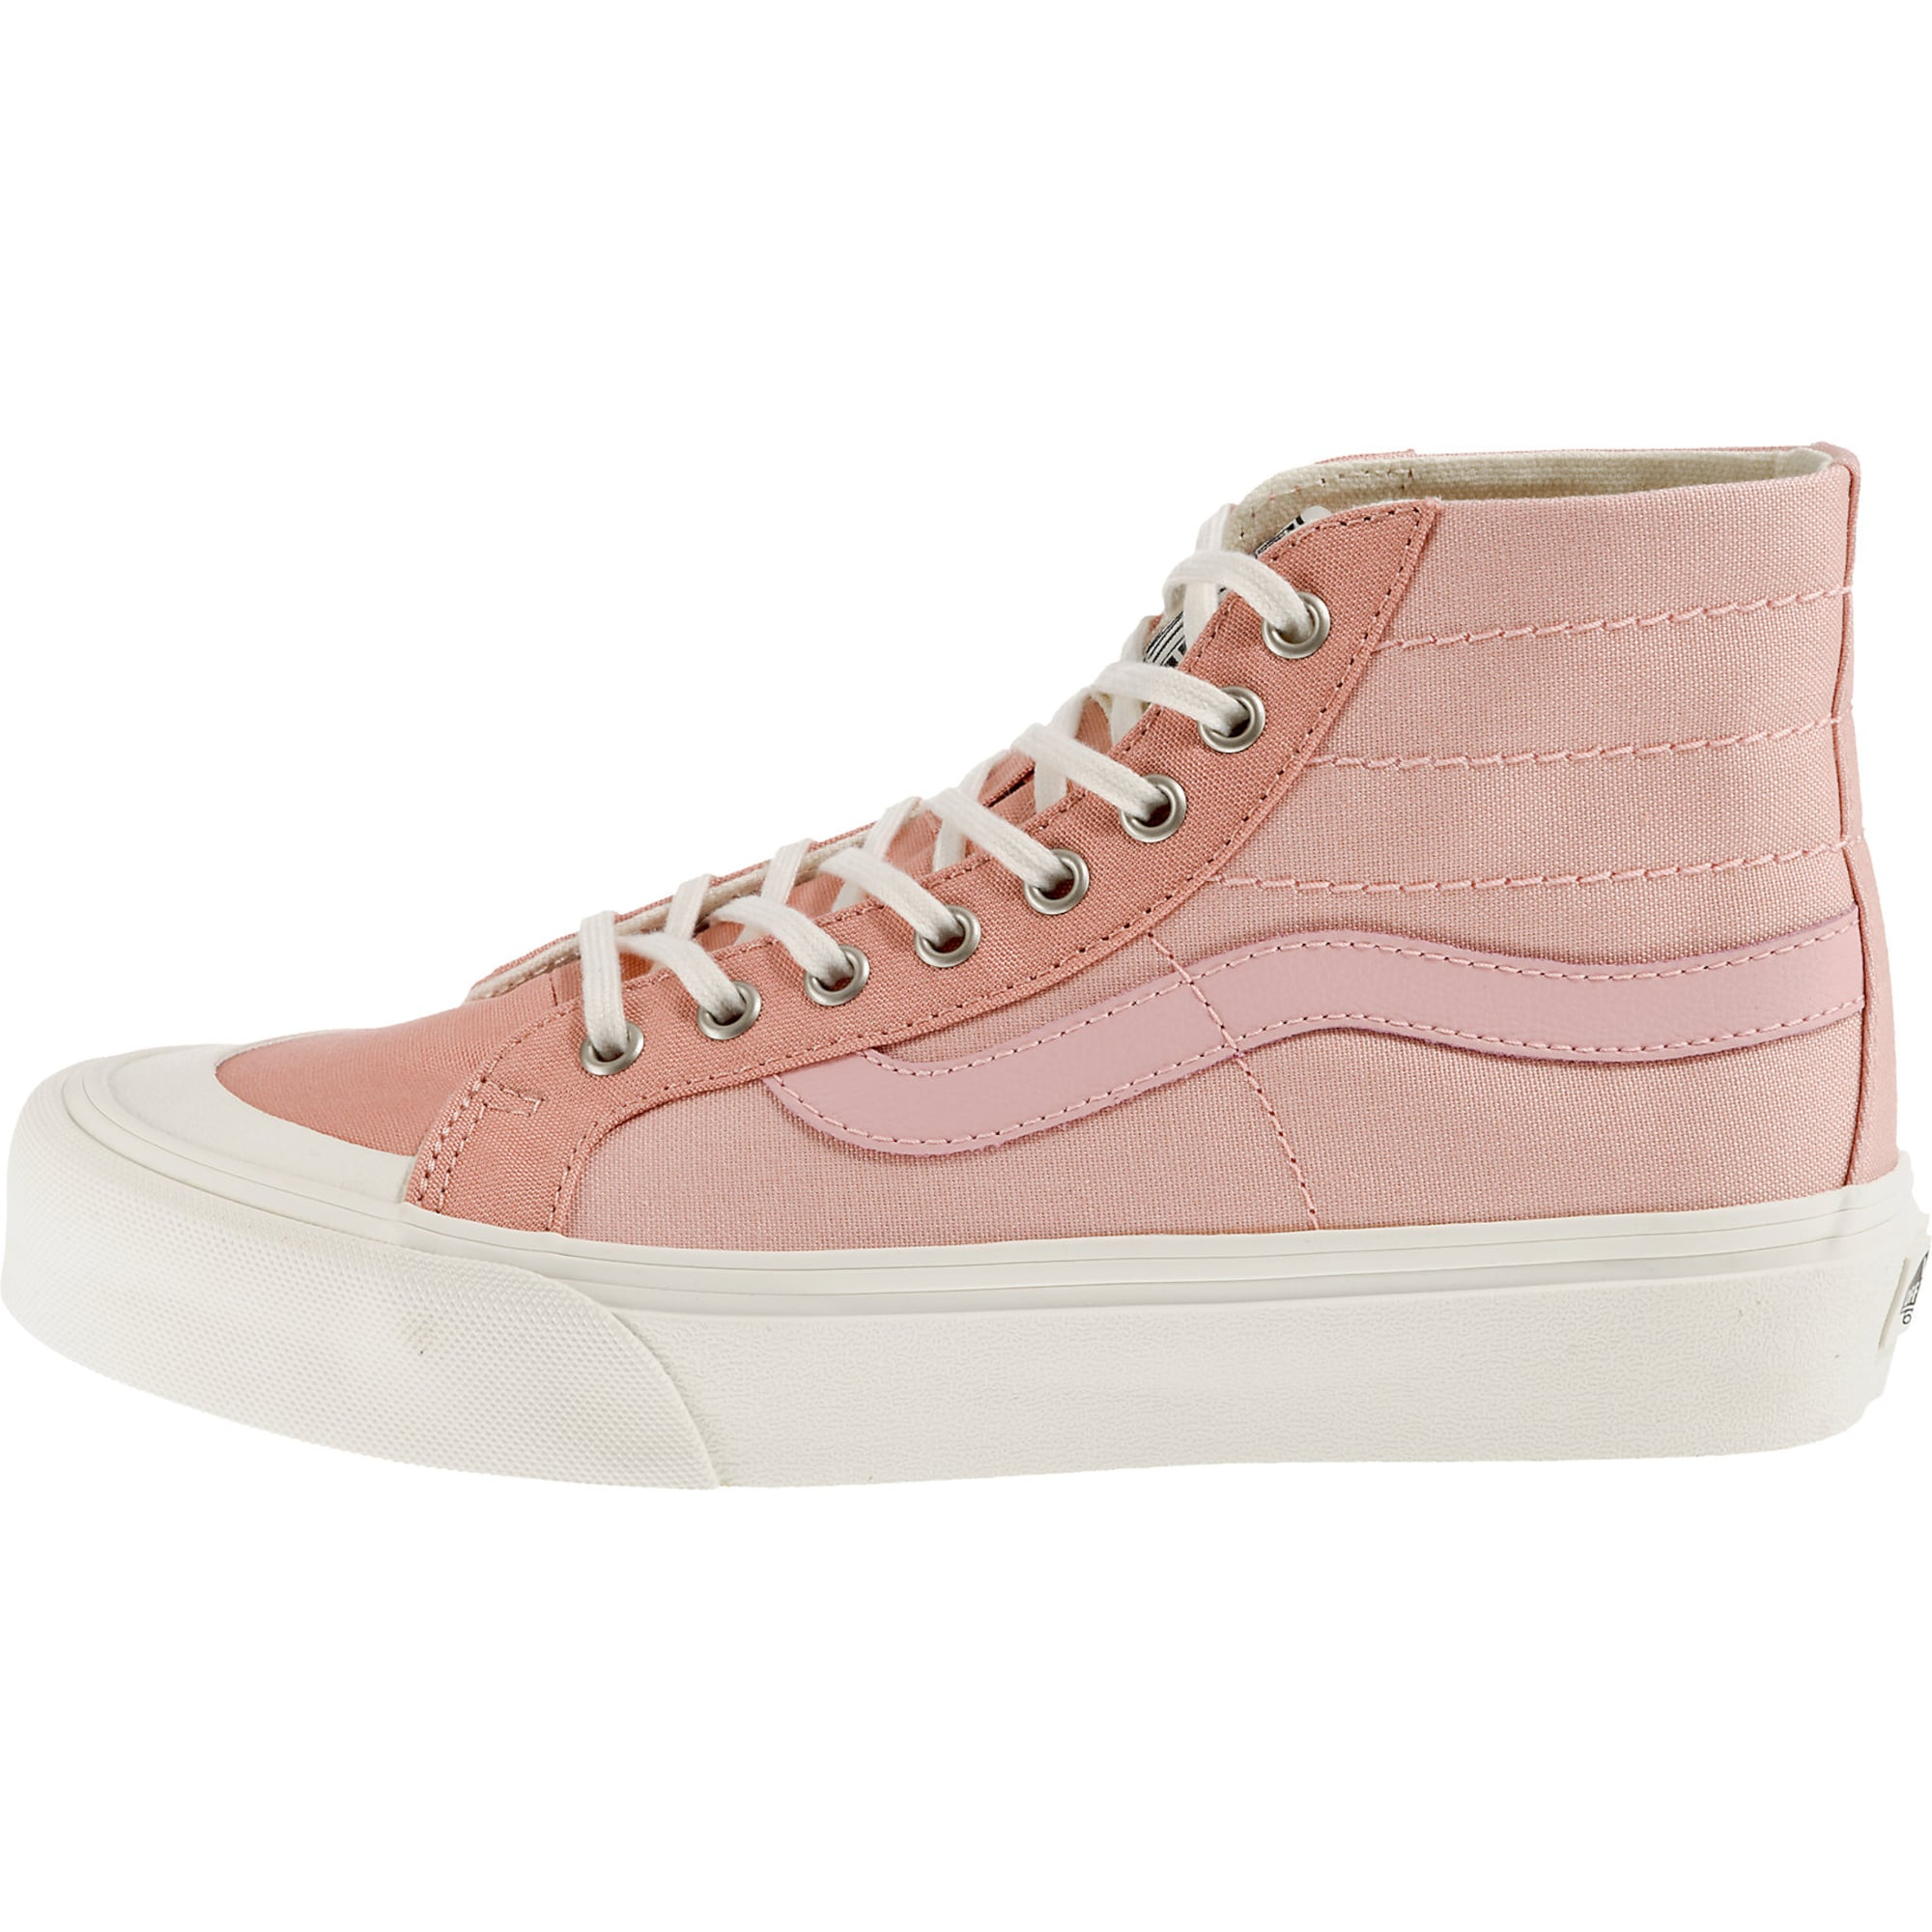 AboutYou | Damen VANS VANS Sneakers UA SK8 HI 138 rosa